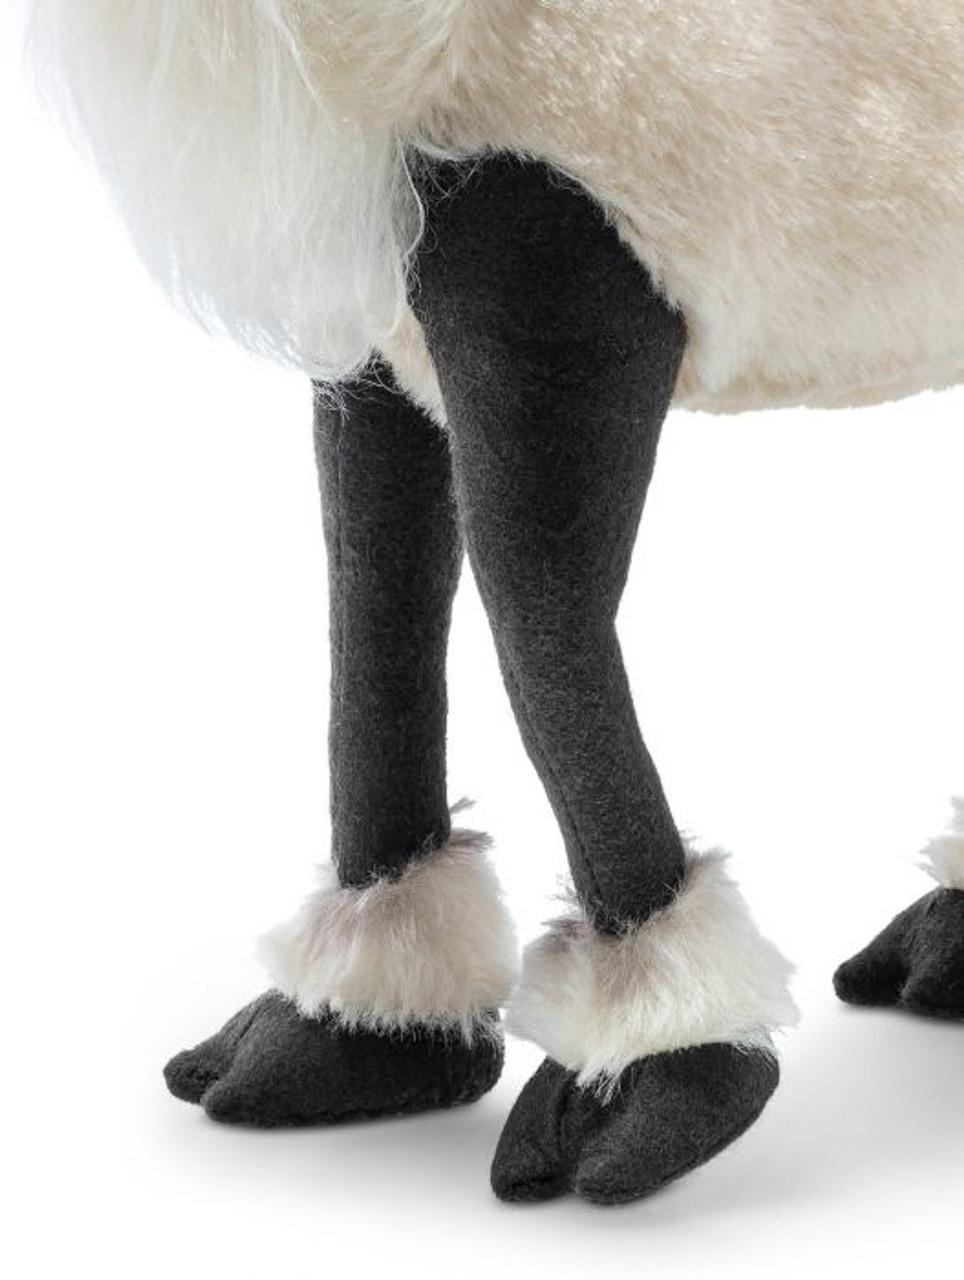 Erik Reindeer Steiff Limited Edition EAN 006074 legs & hooves